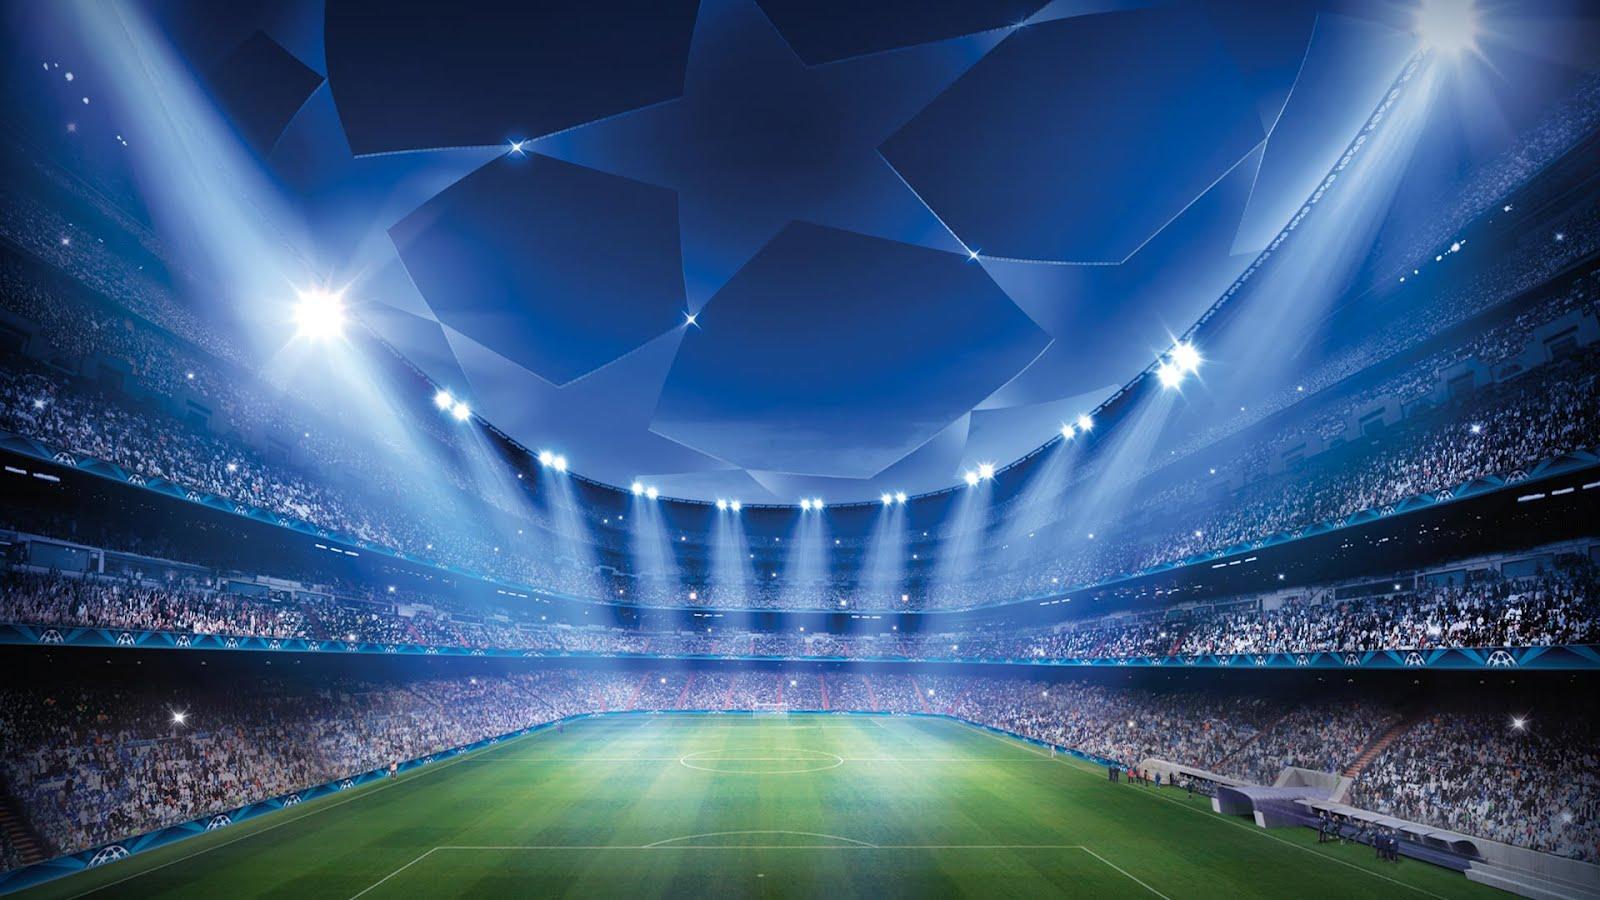 Champions League Wallpaper Wide ImageBankbiz 1600x900